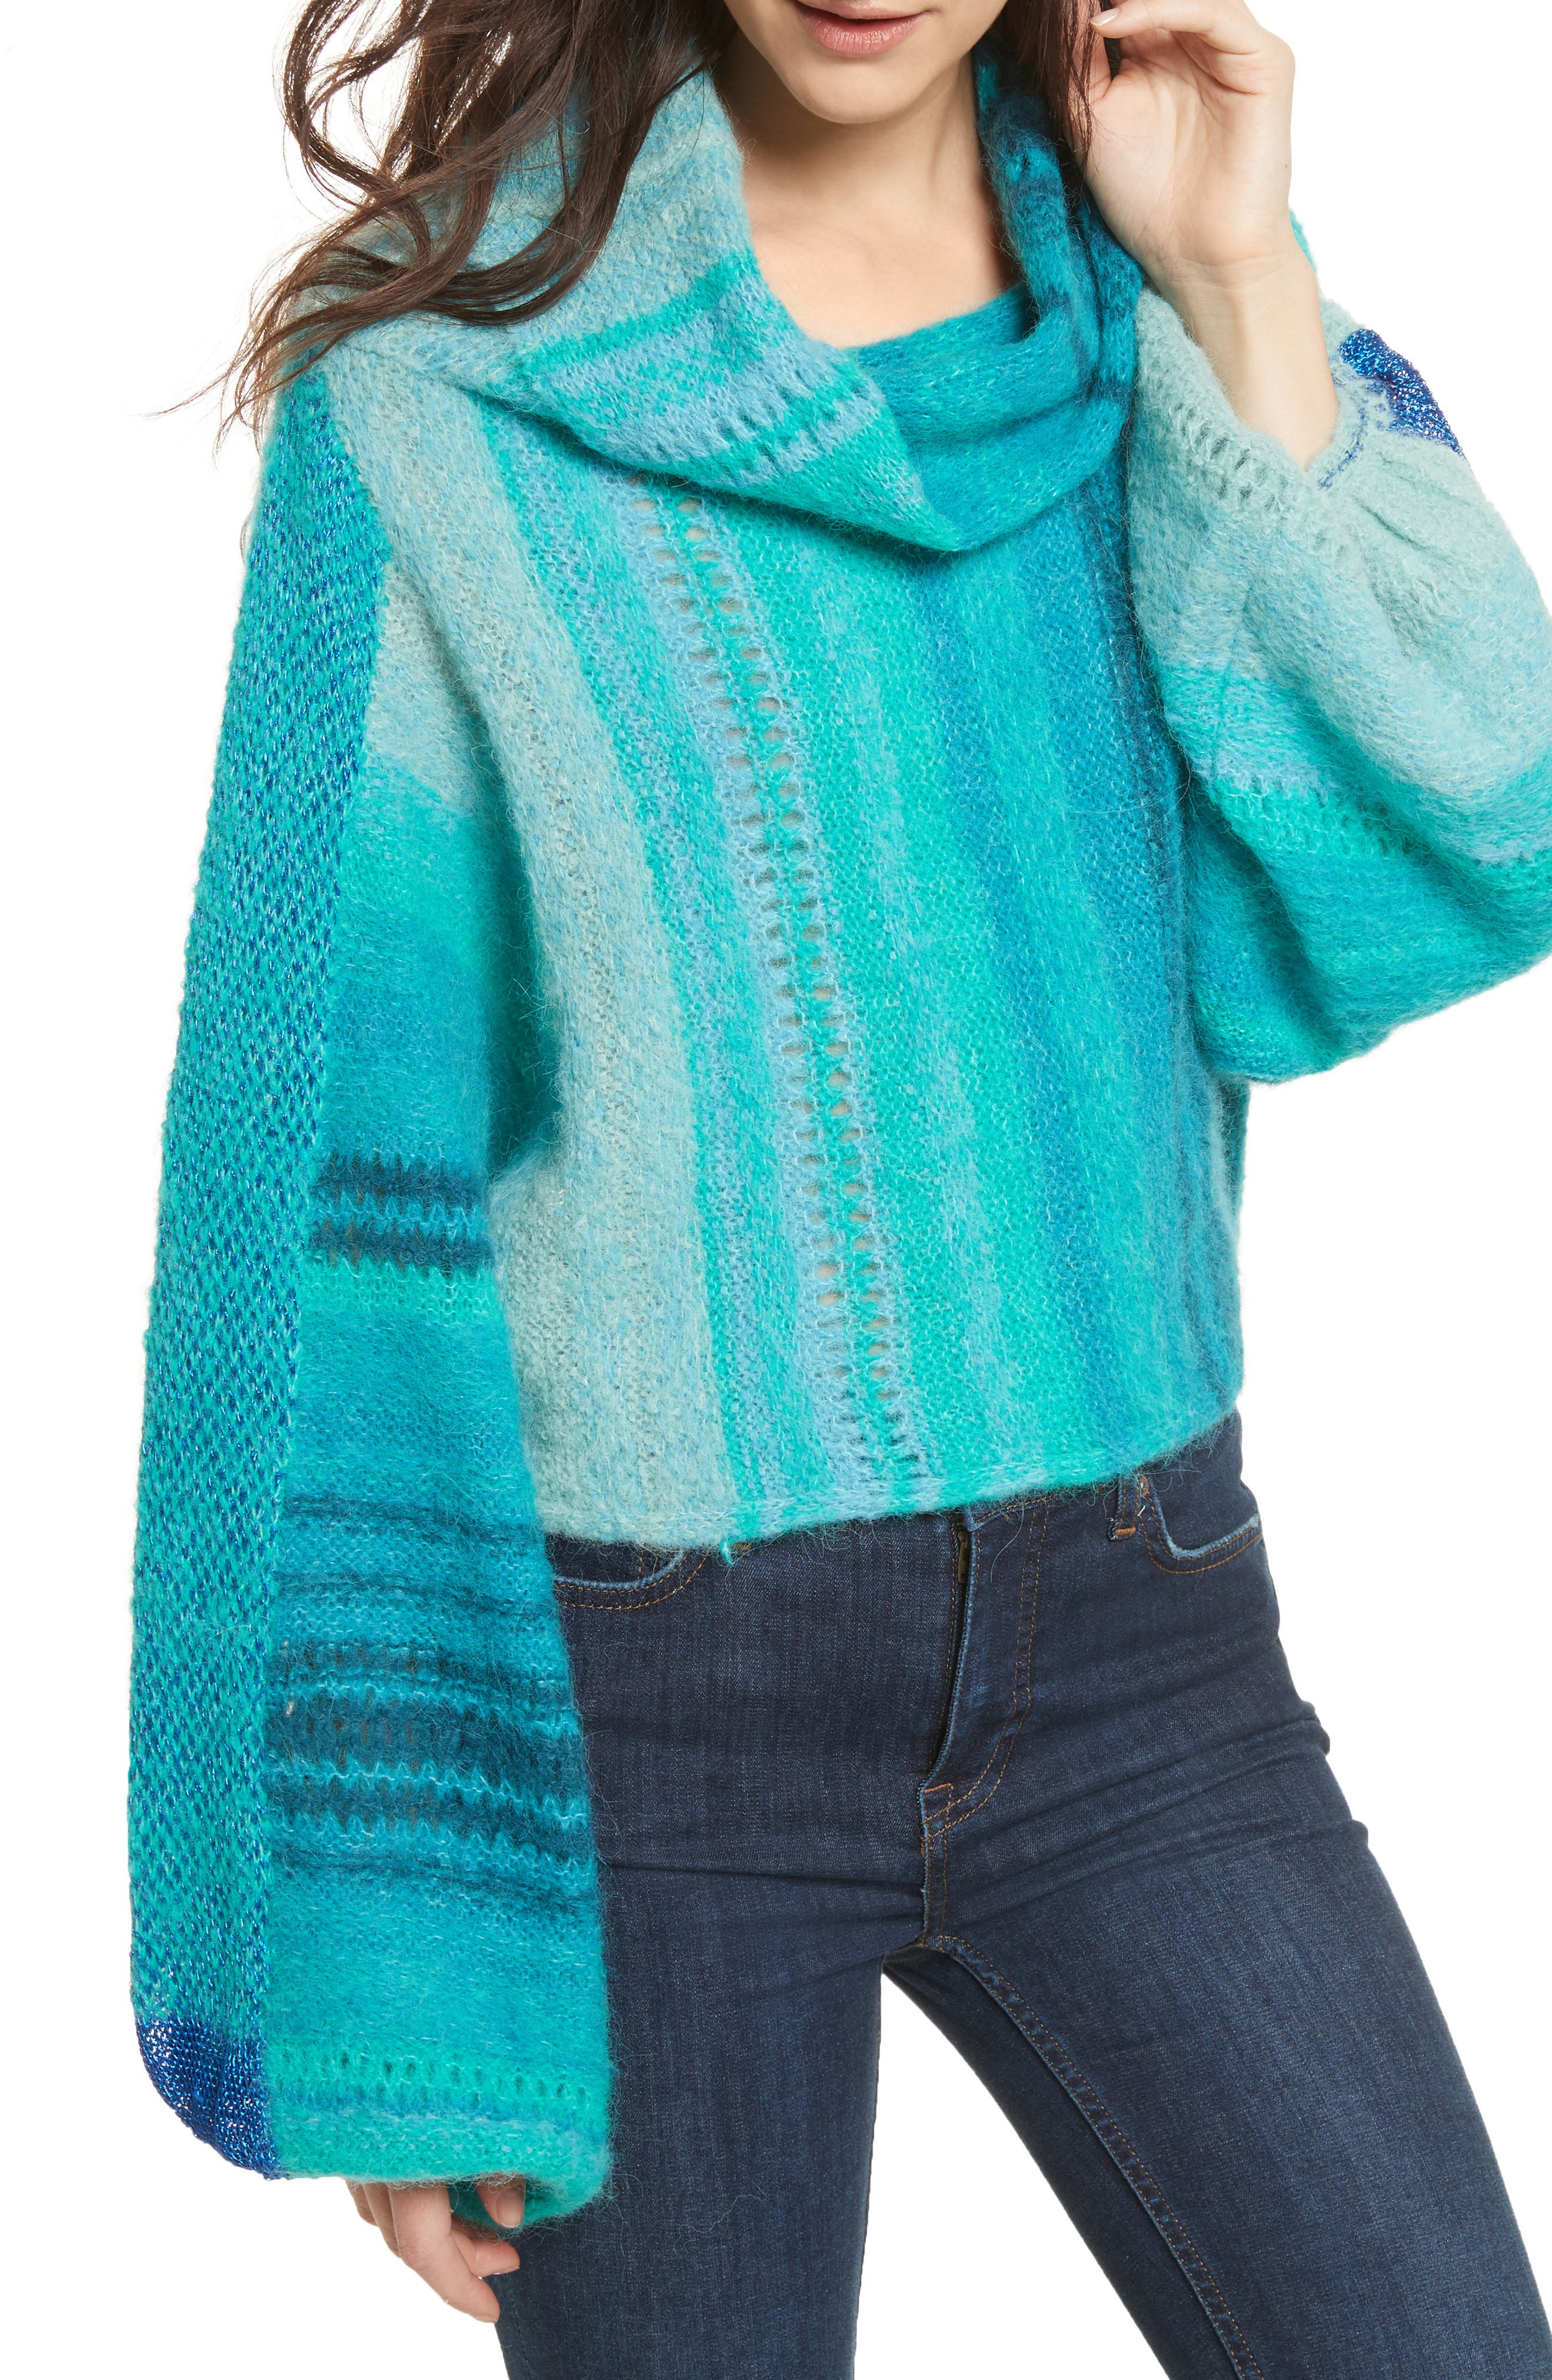 Cloud Kicker Sweater,                             Alternate thumbnail 4, color,                             Blue Combo